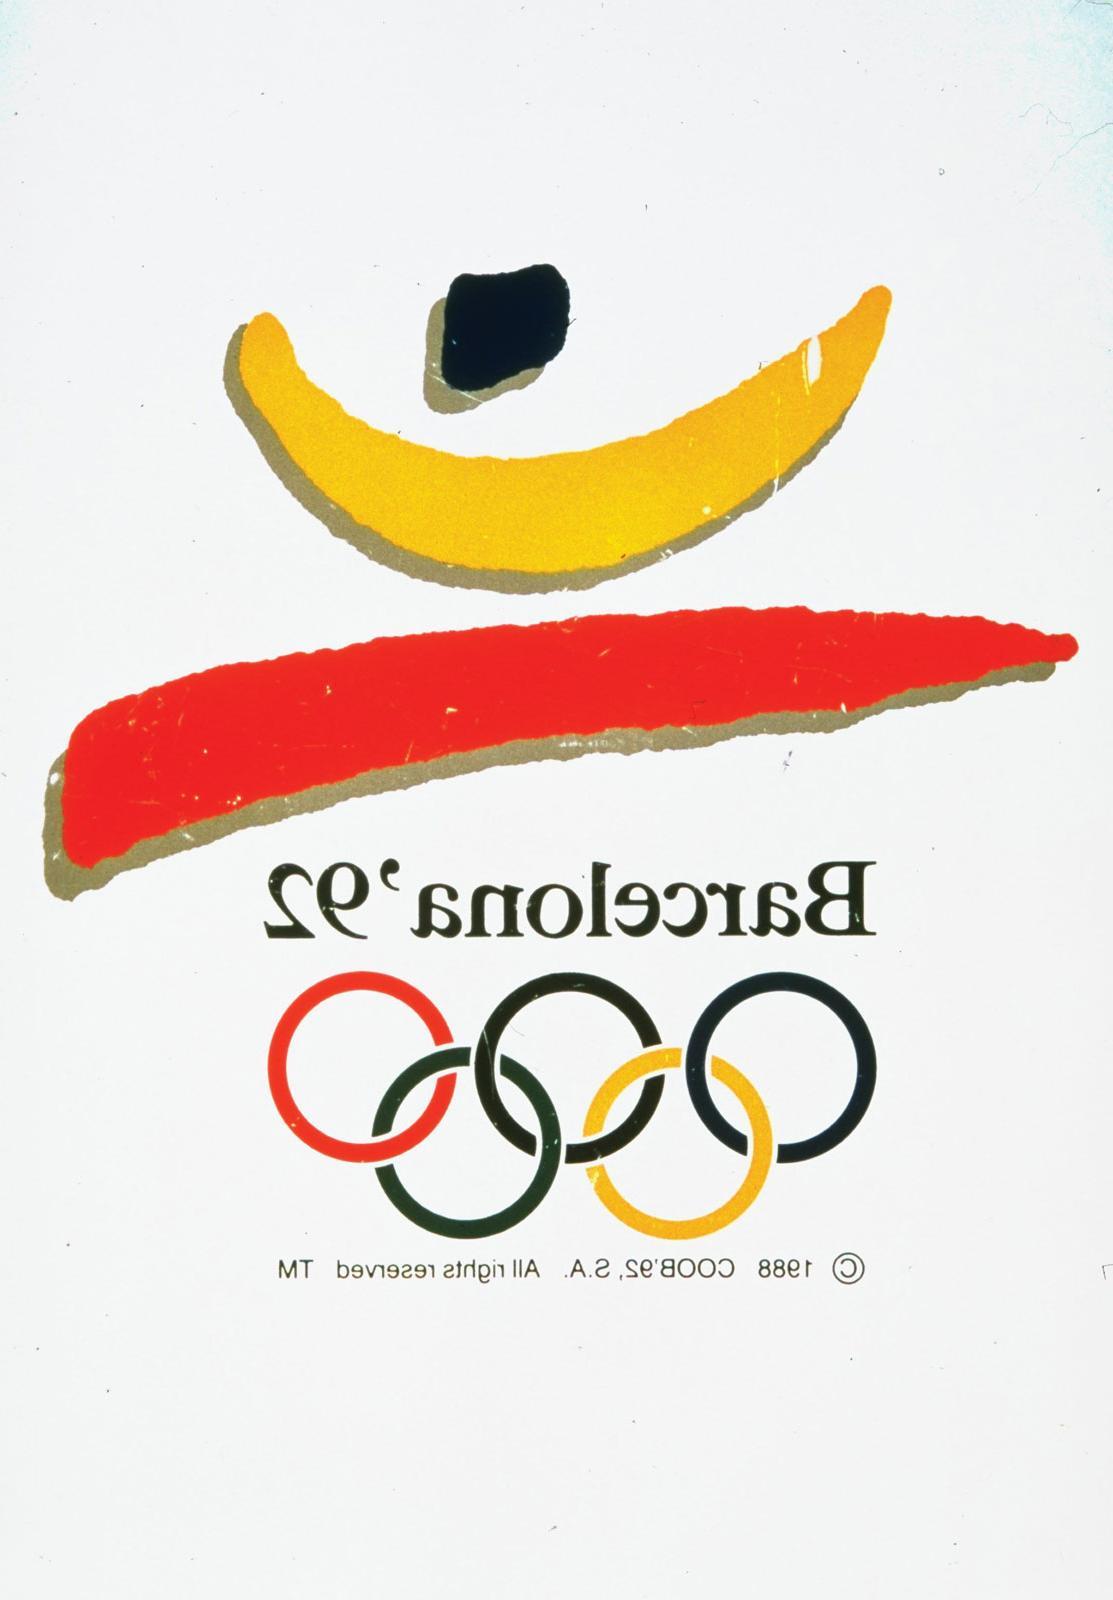 Olympics Barcelona, Spain.